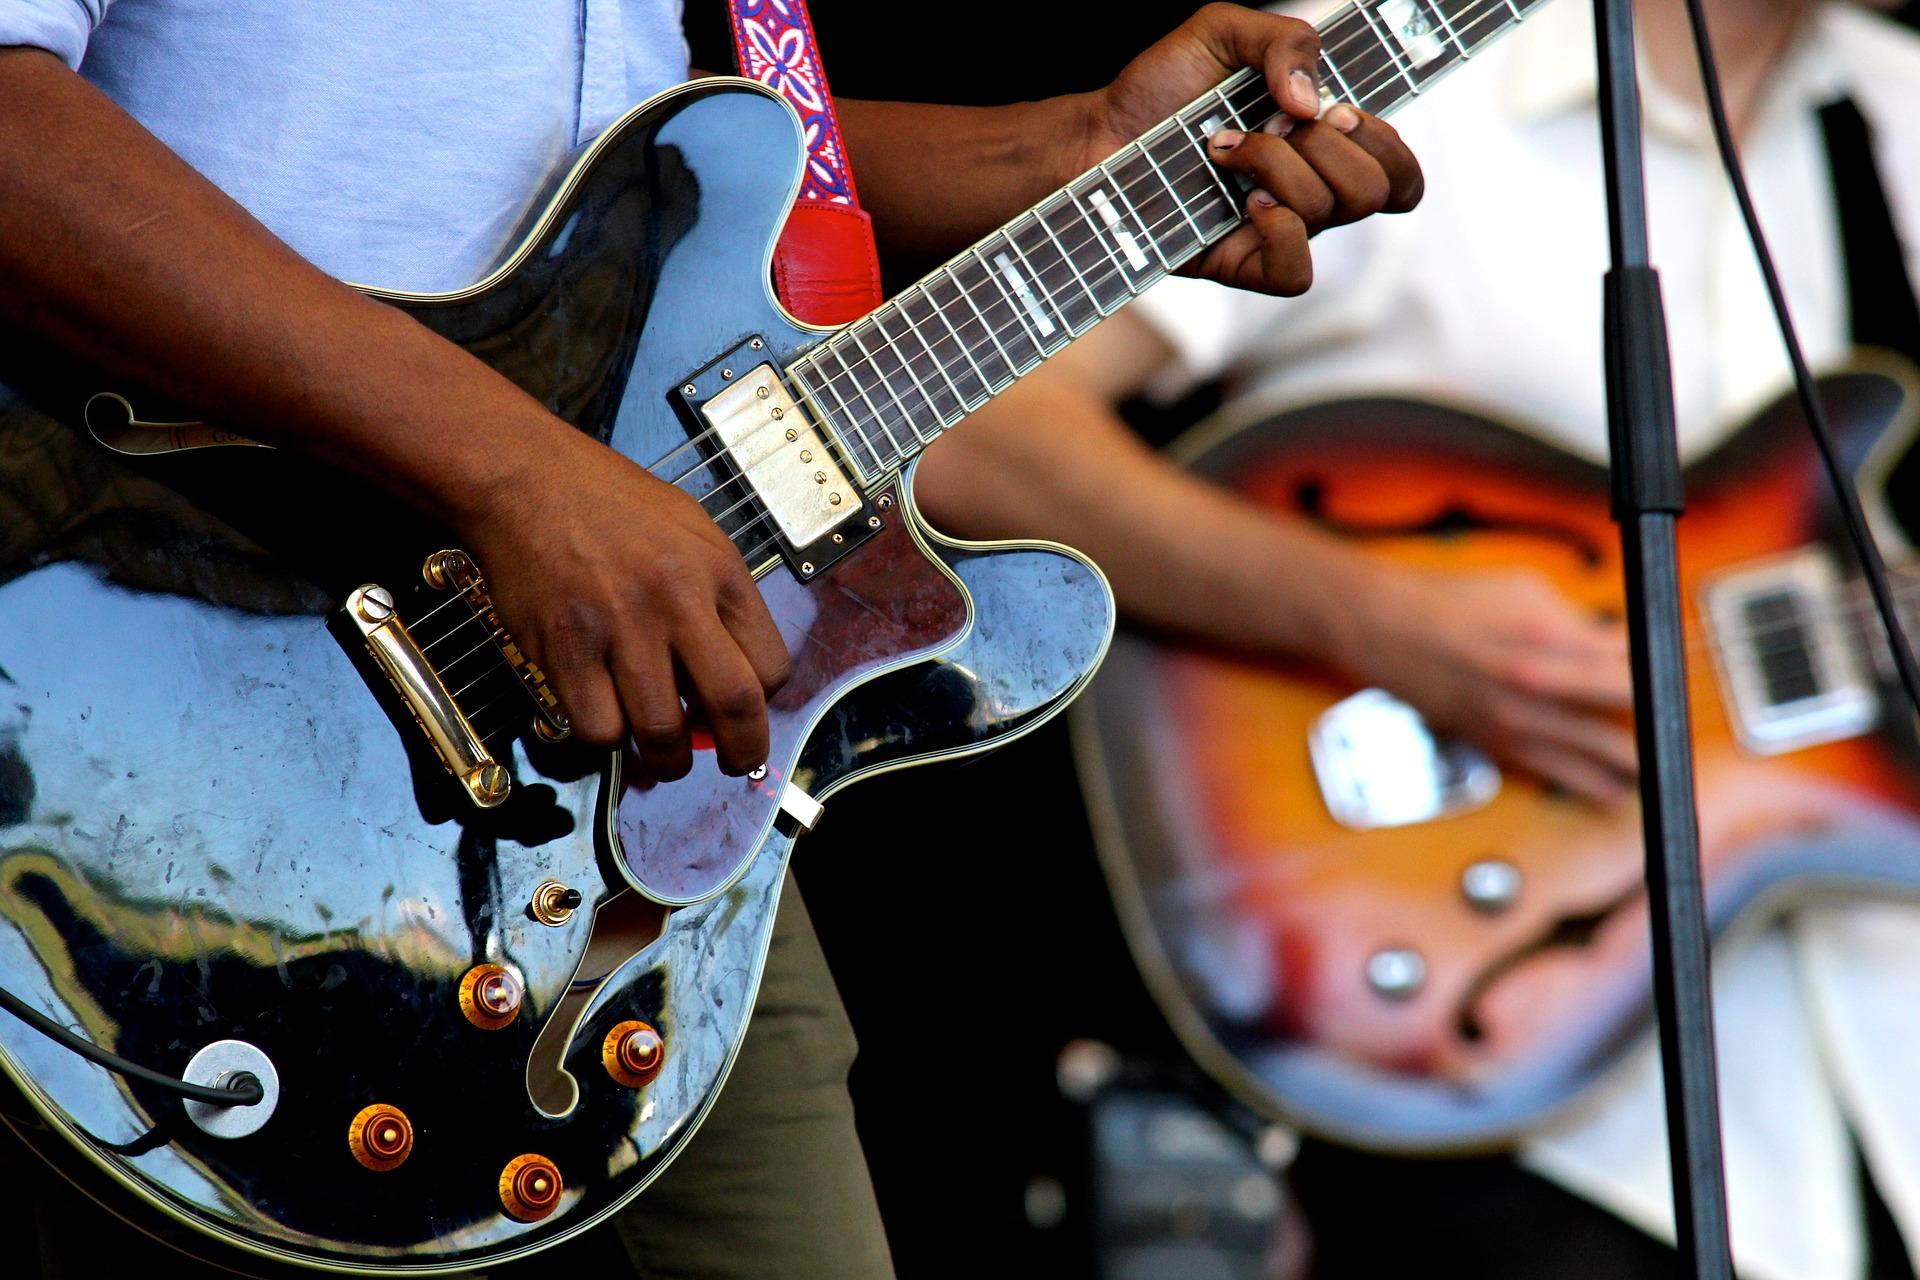 guitars-2033566_1920.jpg